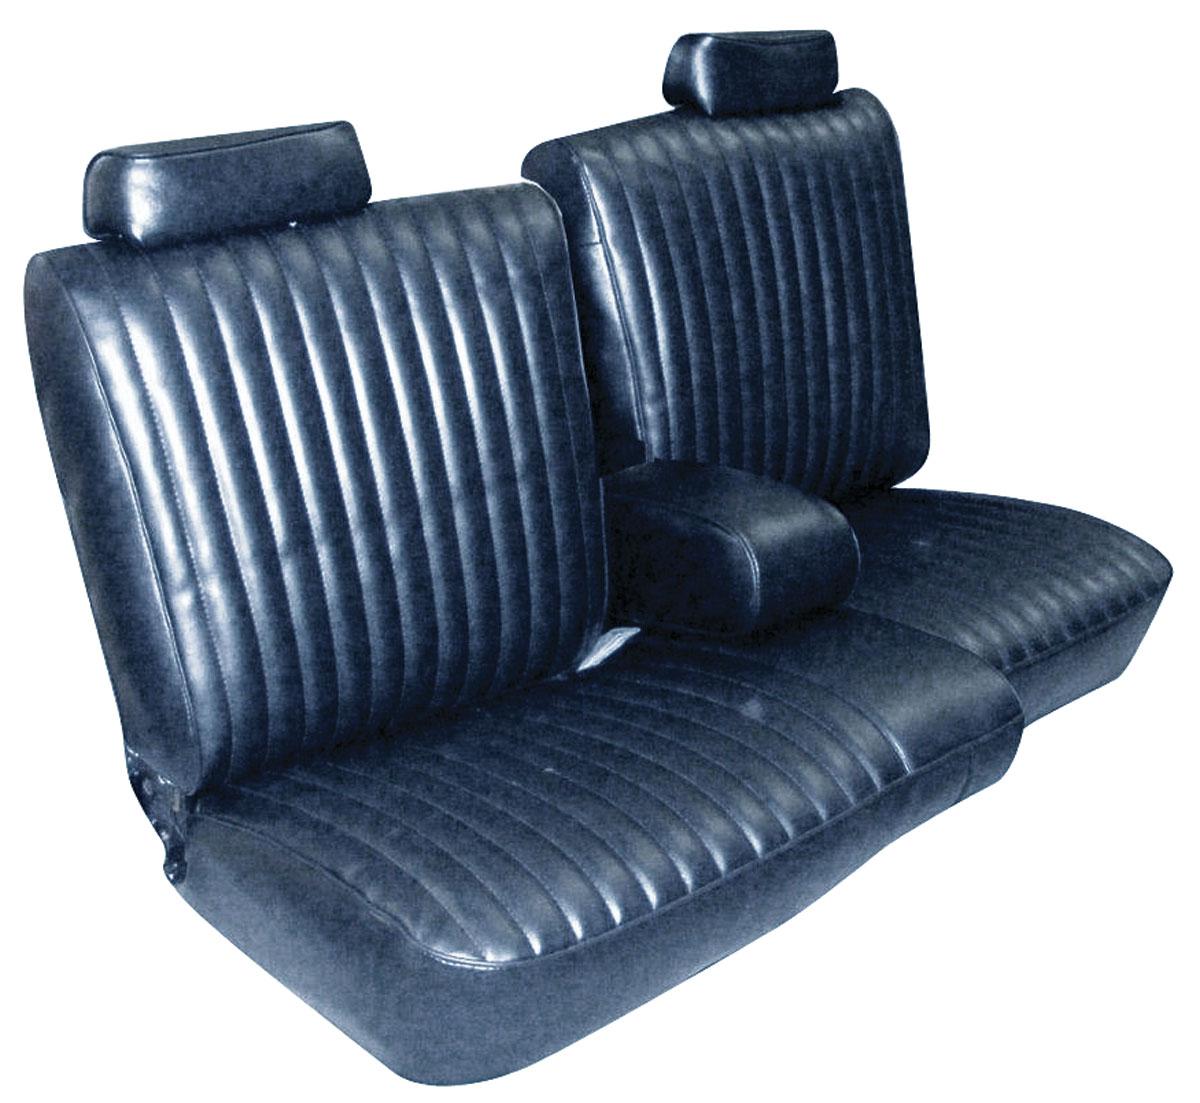 Seat Upholstery 1981 87 El Camino 1981 Malibu Front